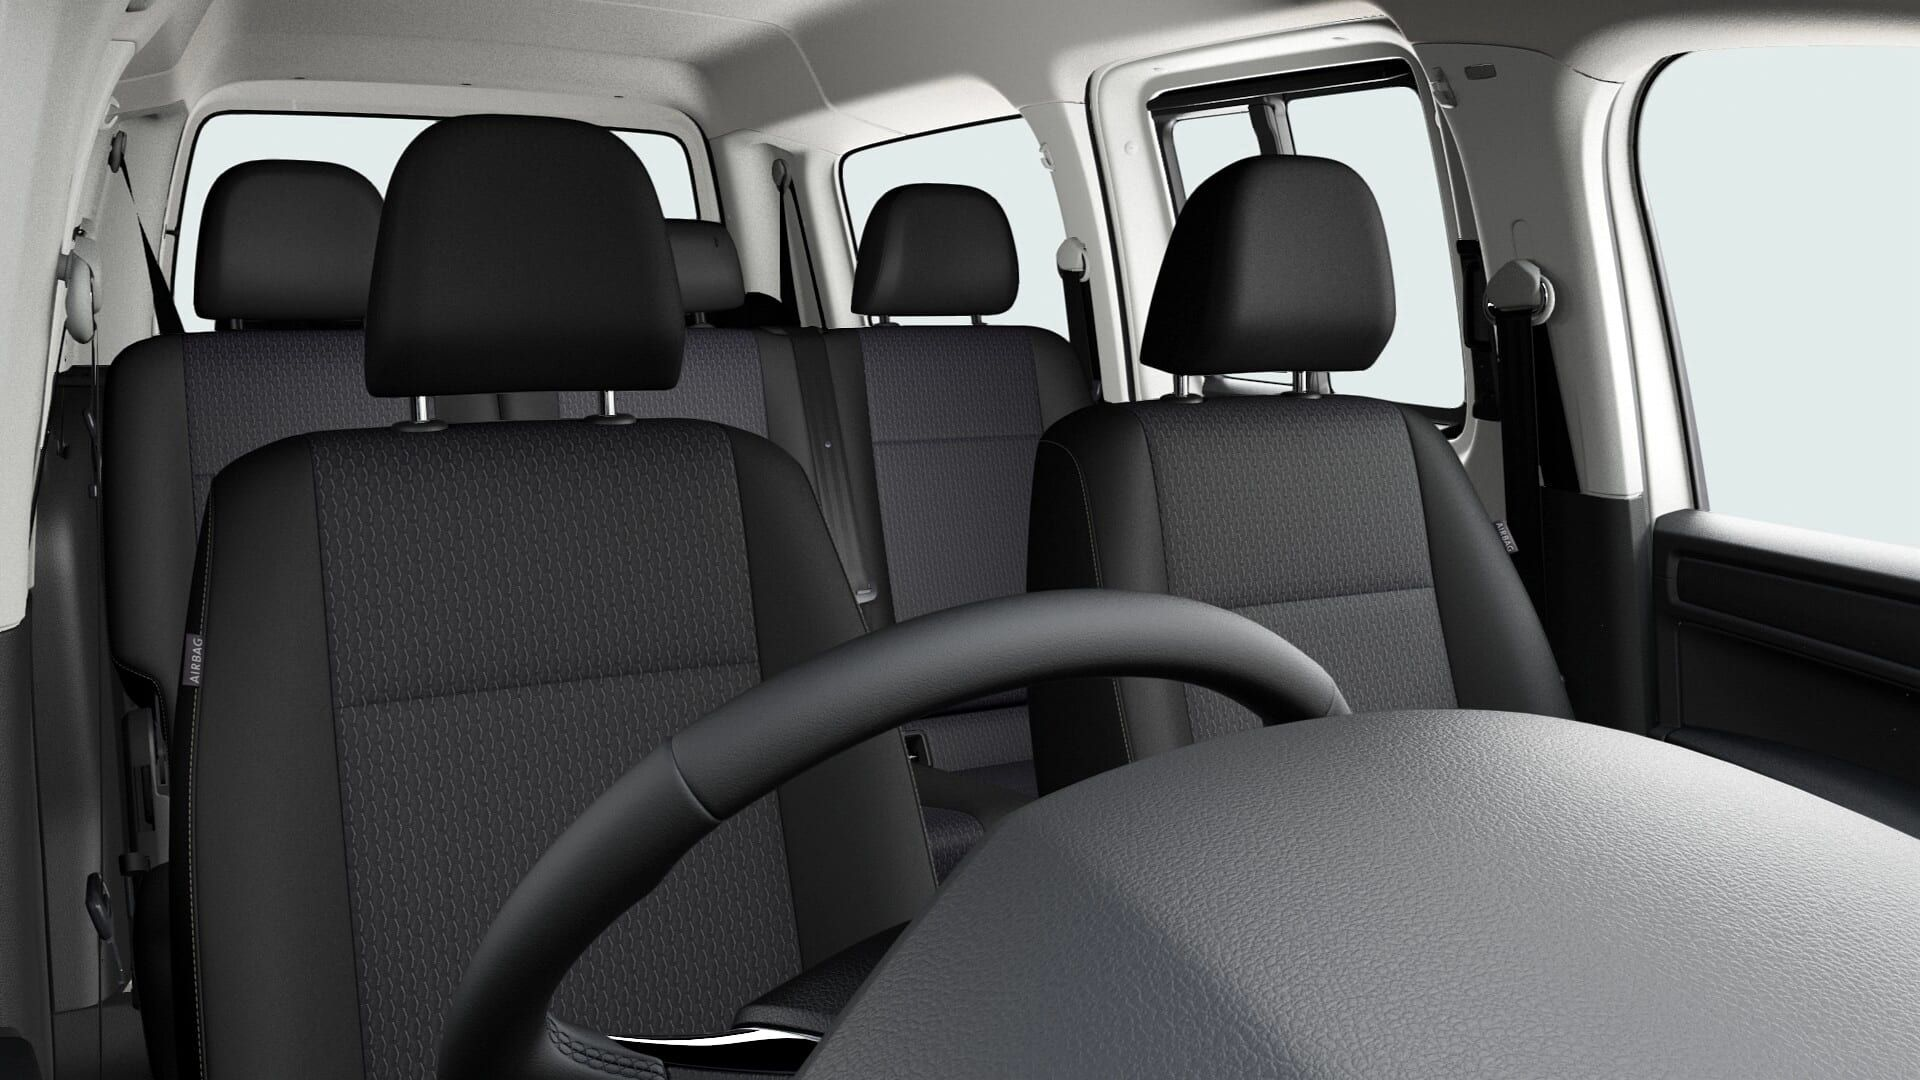 Interior All Seats